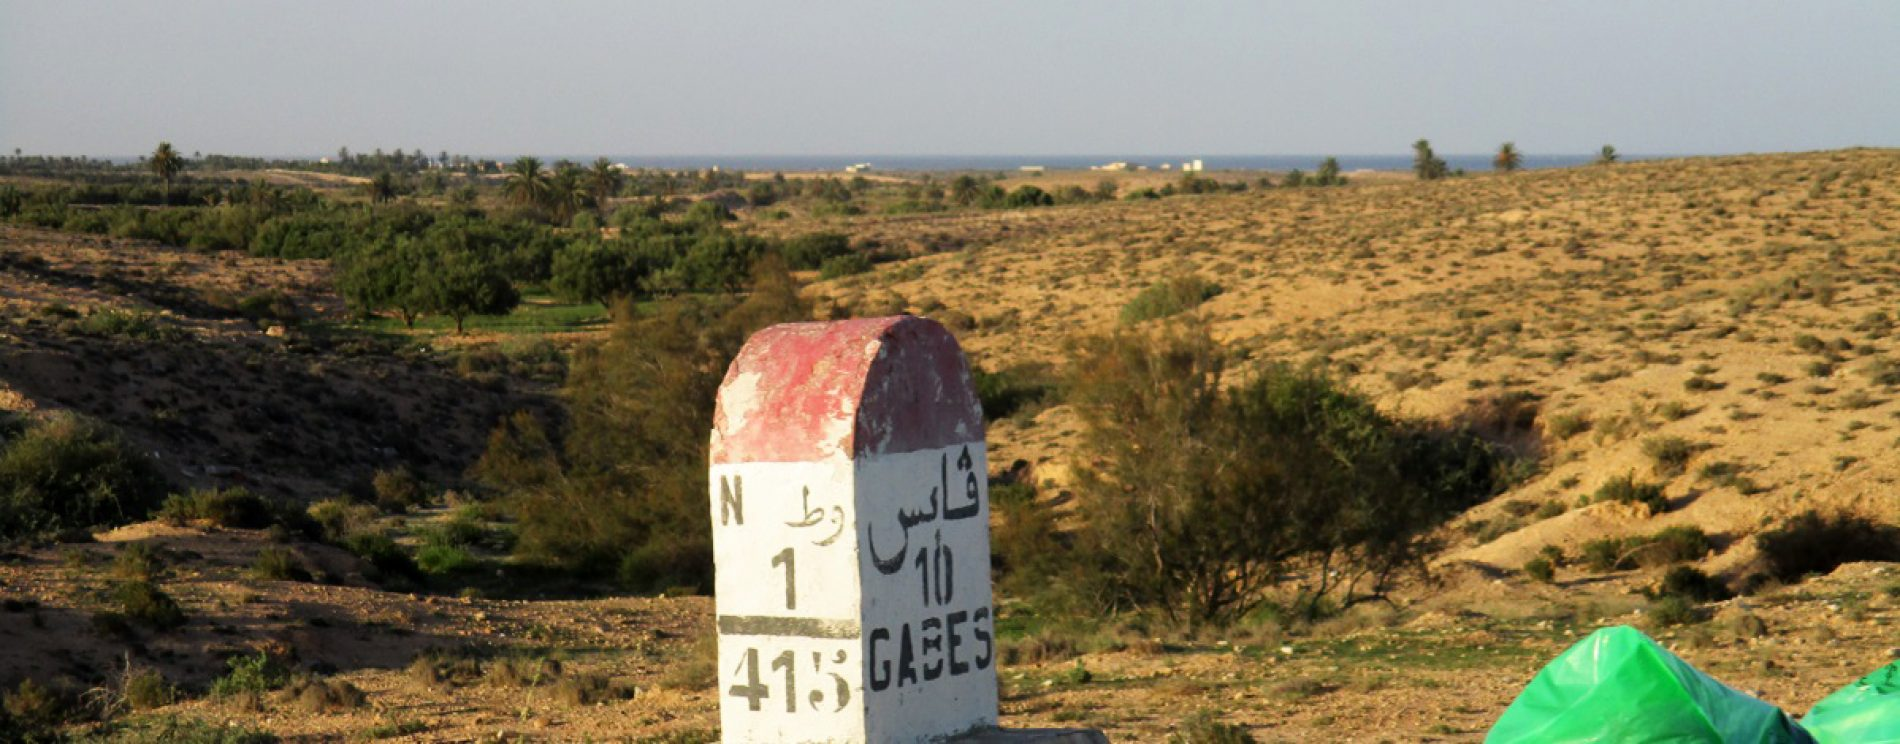 Tunisie : La gouvernance environnementale au coeur de Gabès